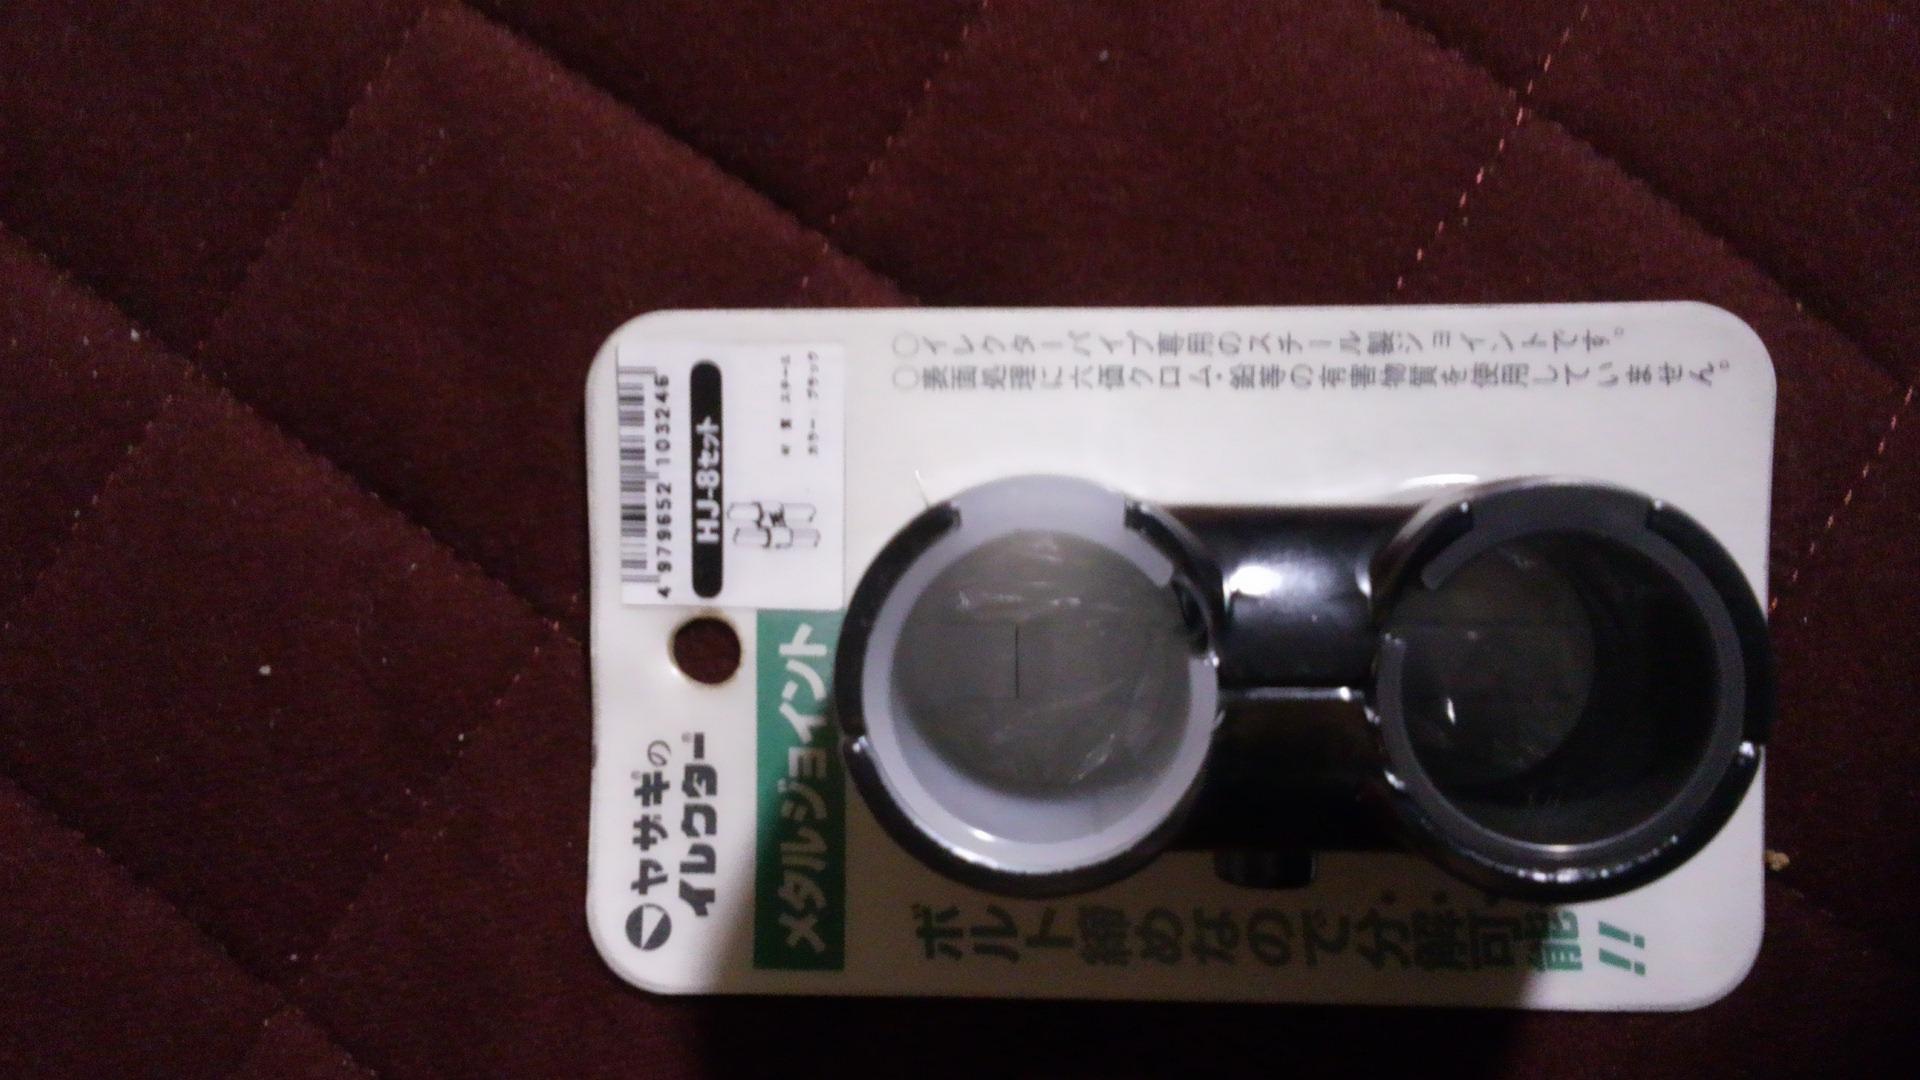 DCIM0233.JPG